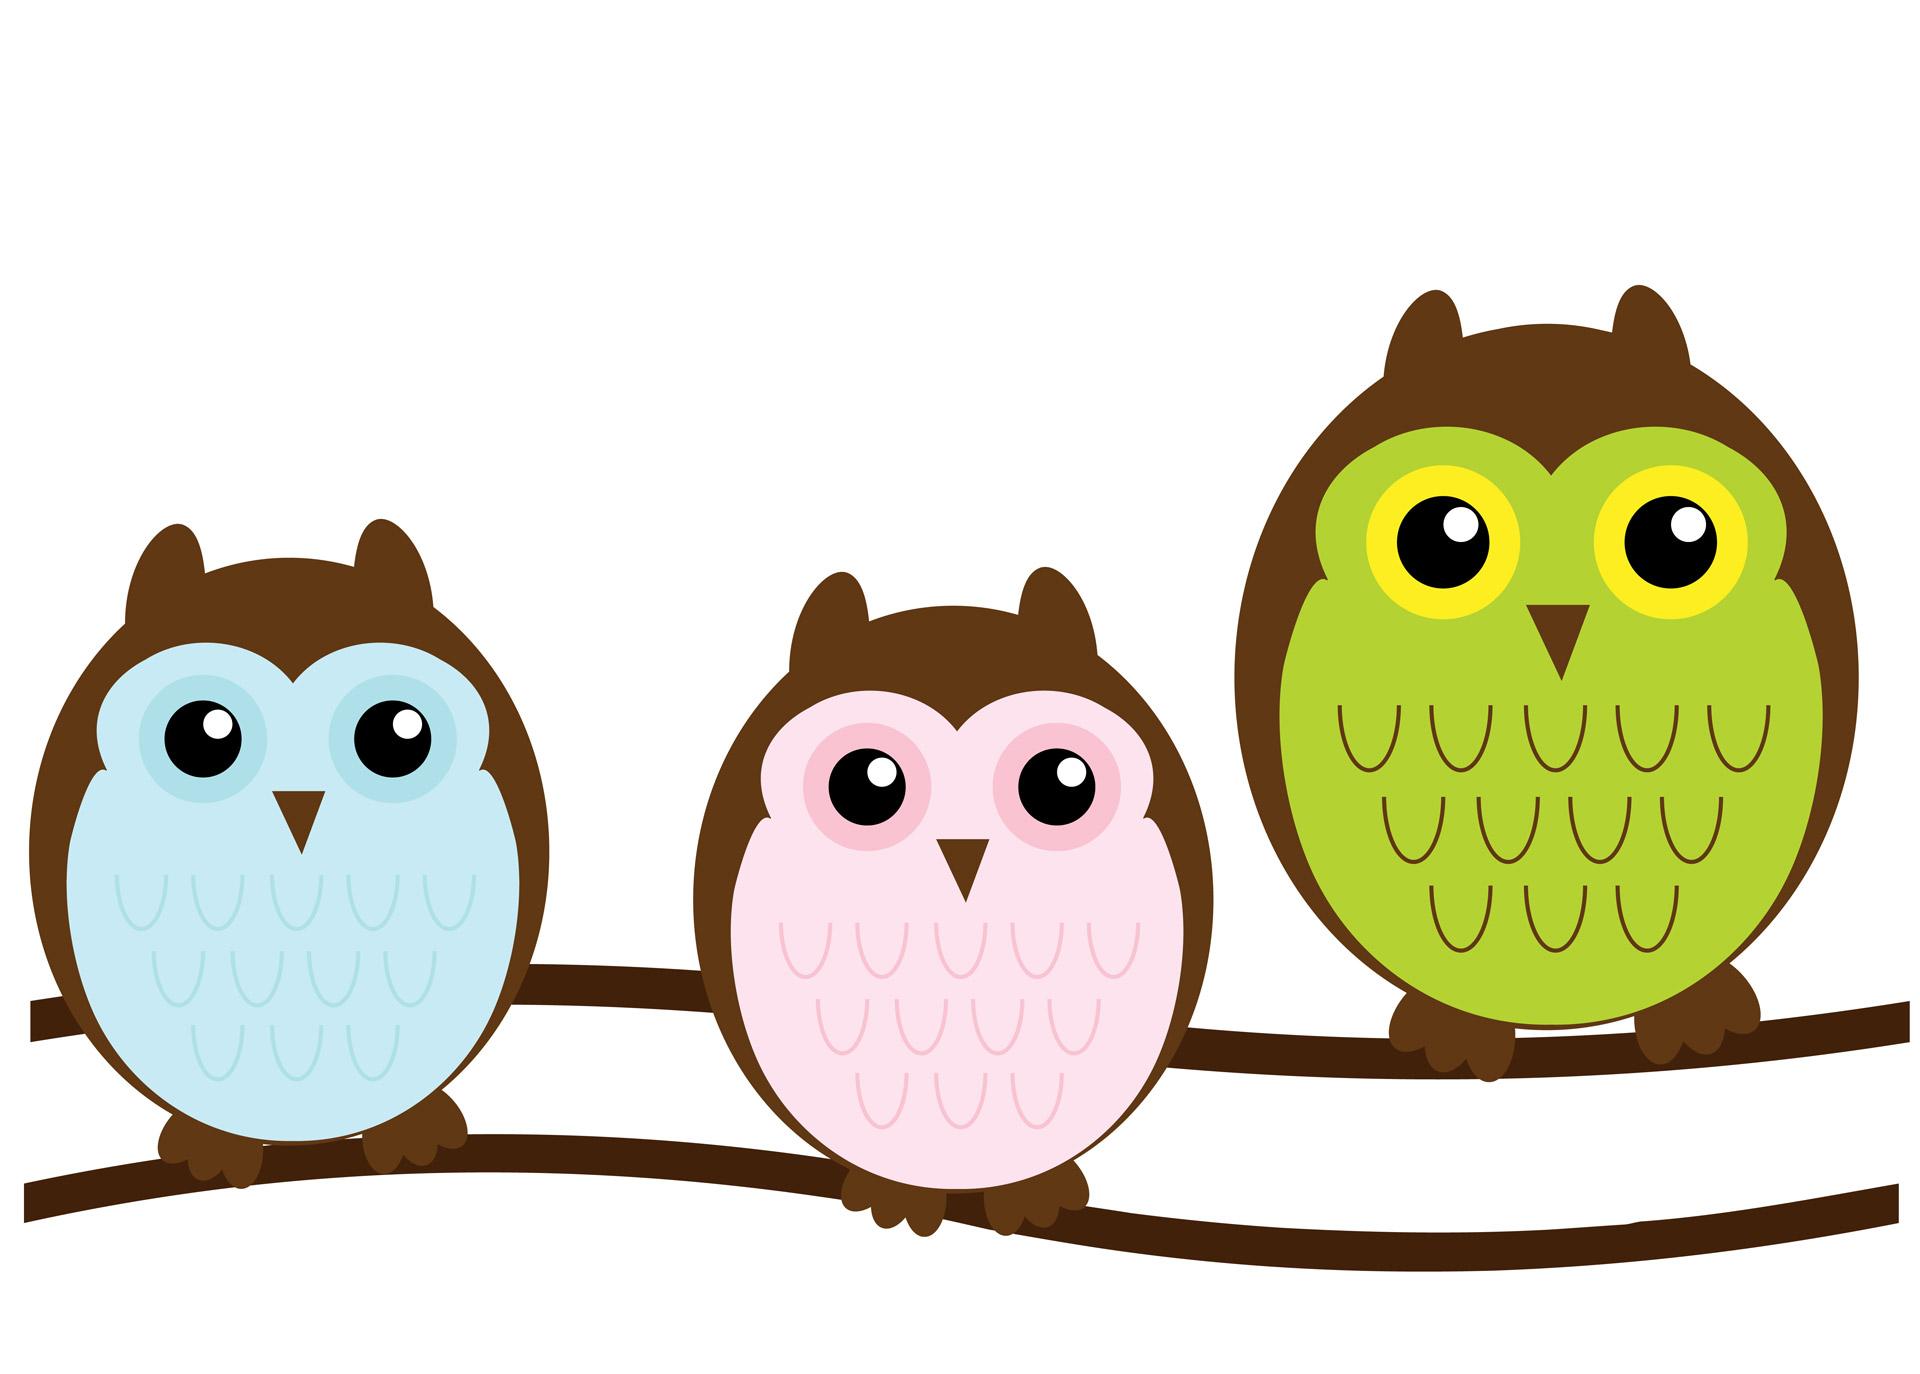 1920x1374 Owl Family Cute Clipart Free Stock Photo